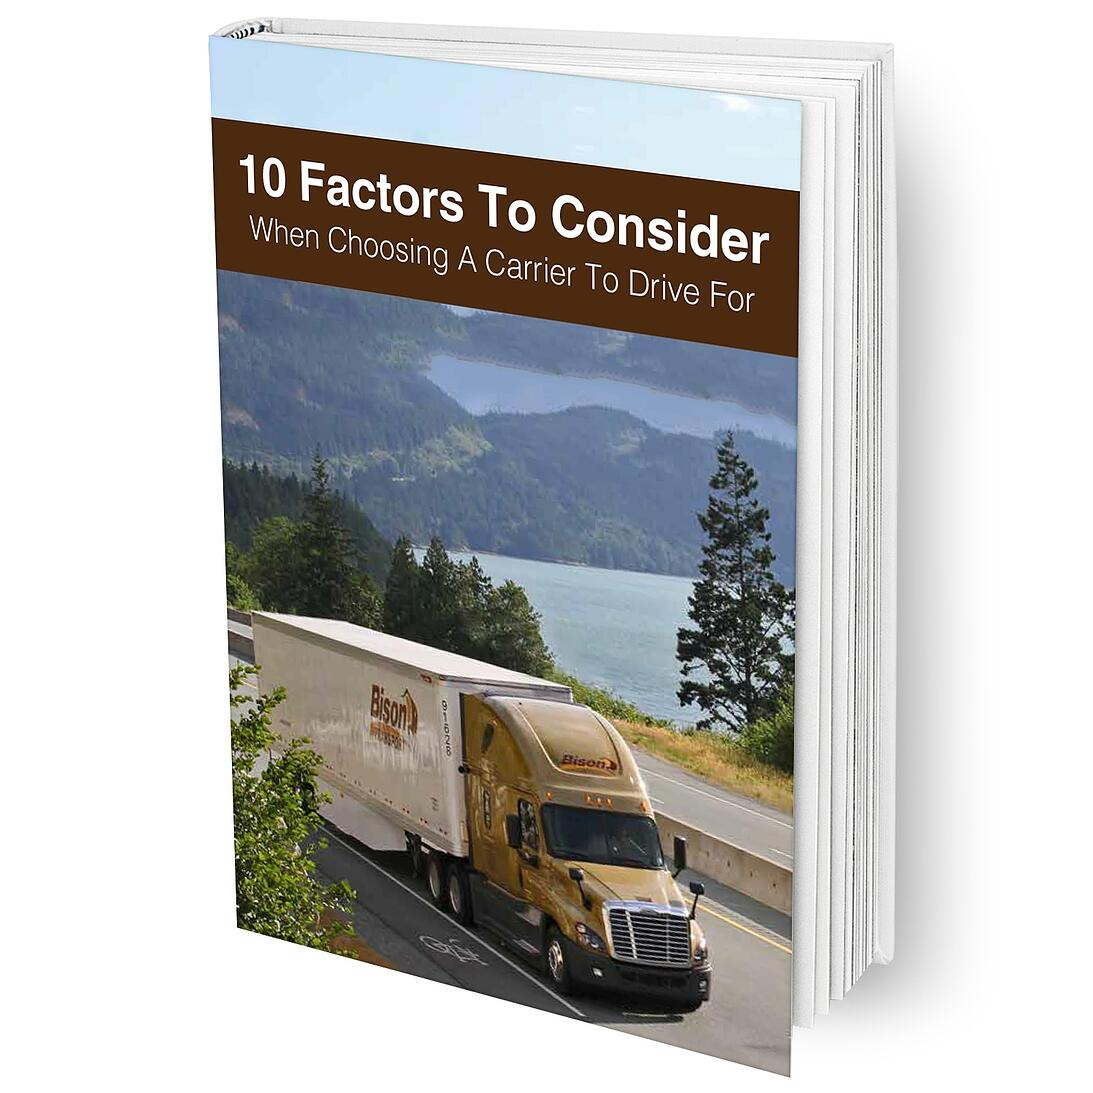 10_Factors_Book.jpg